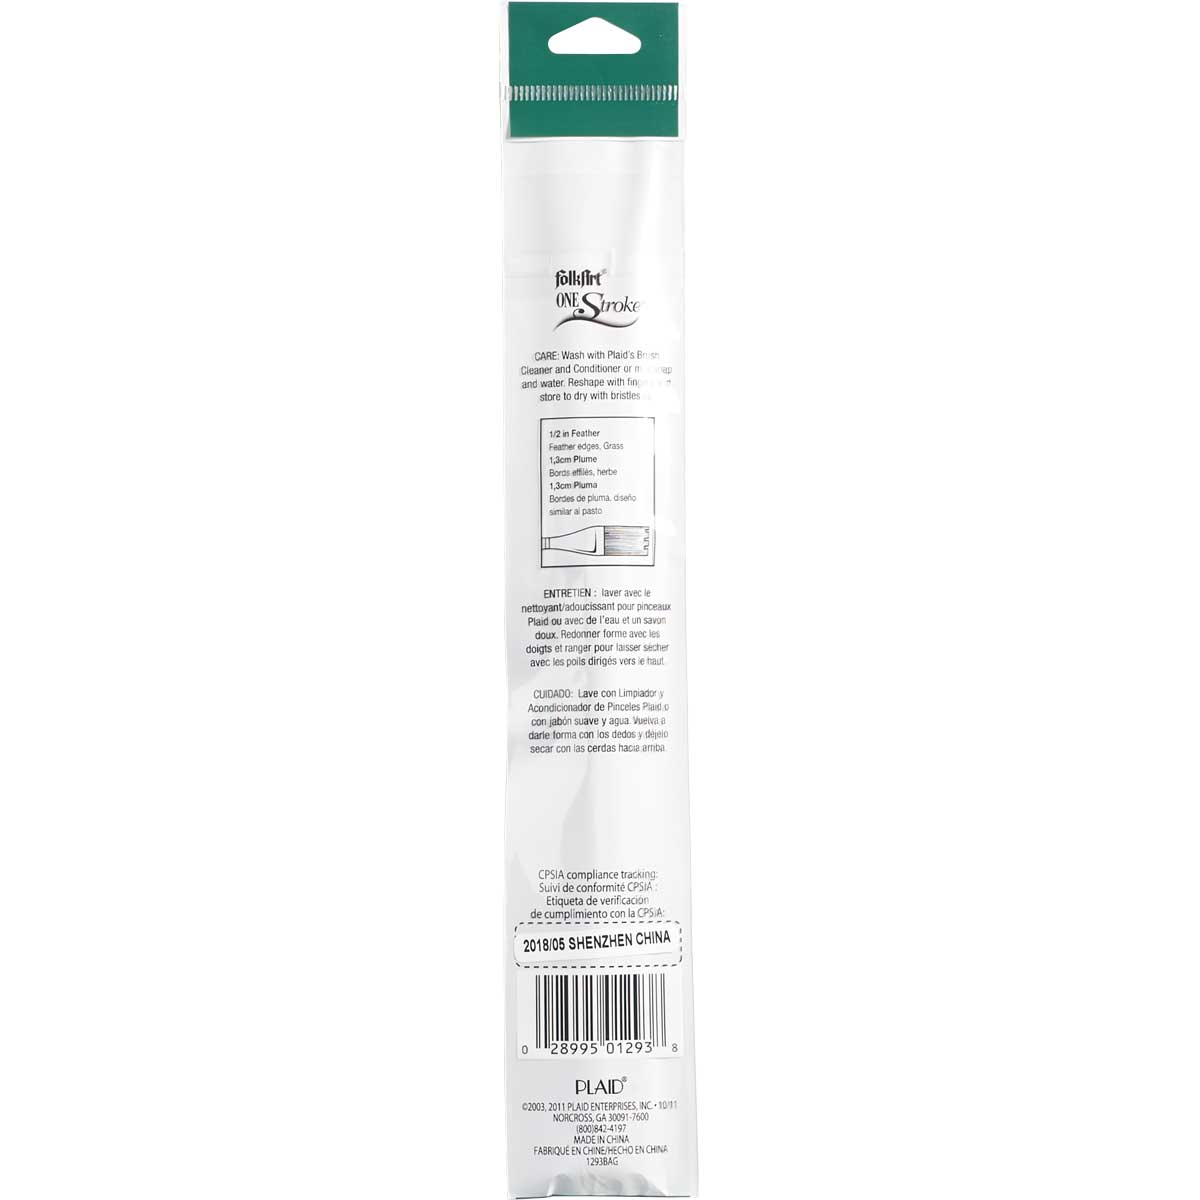 FolkArt ® One Stroke™ Brushes - Feather Brush, 1/2